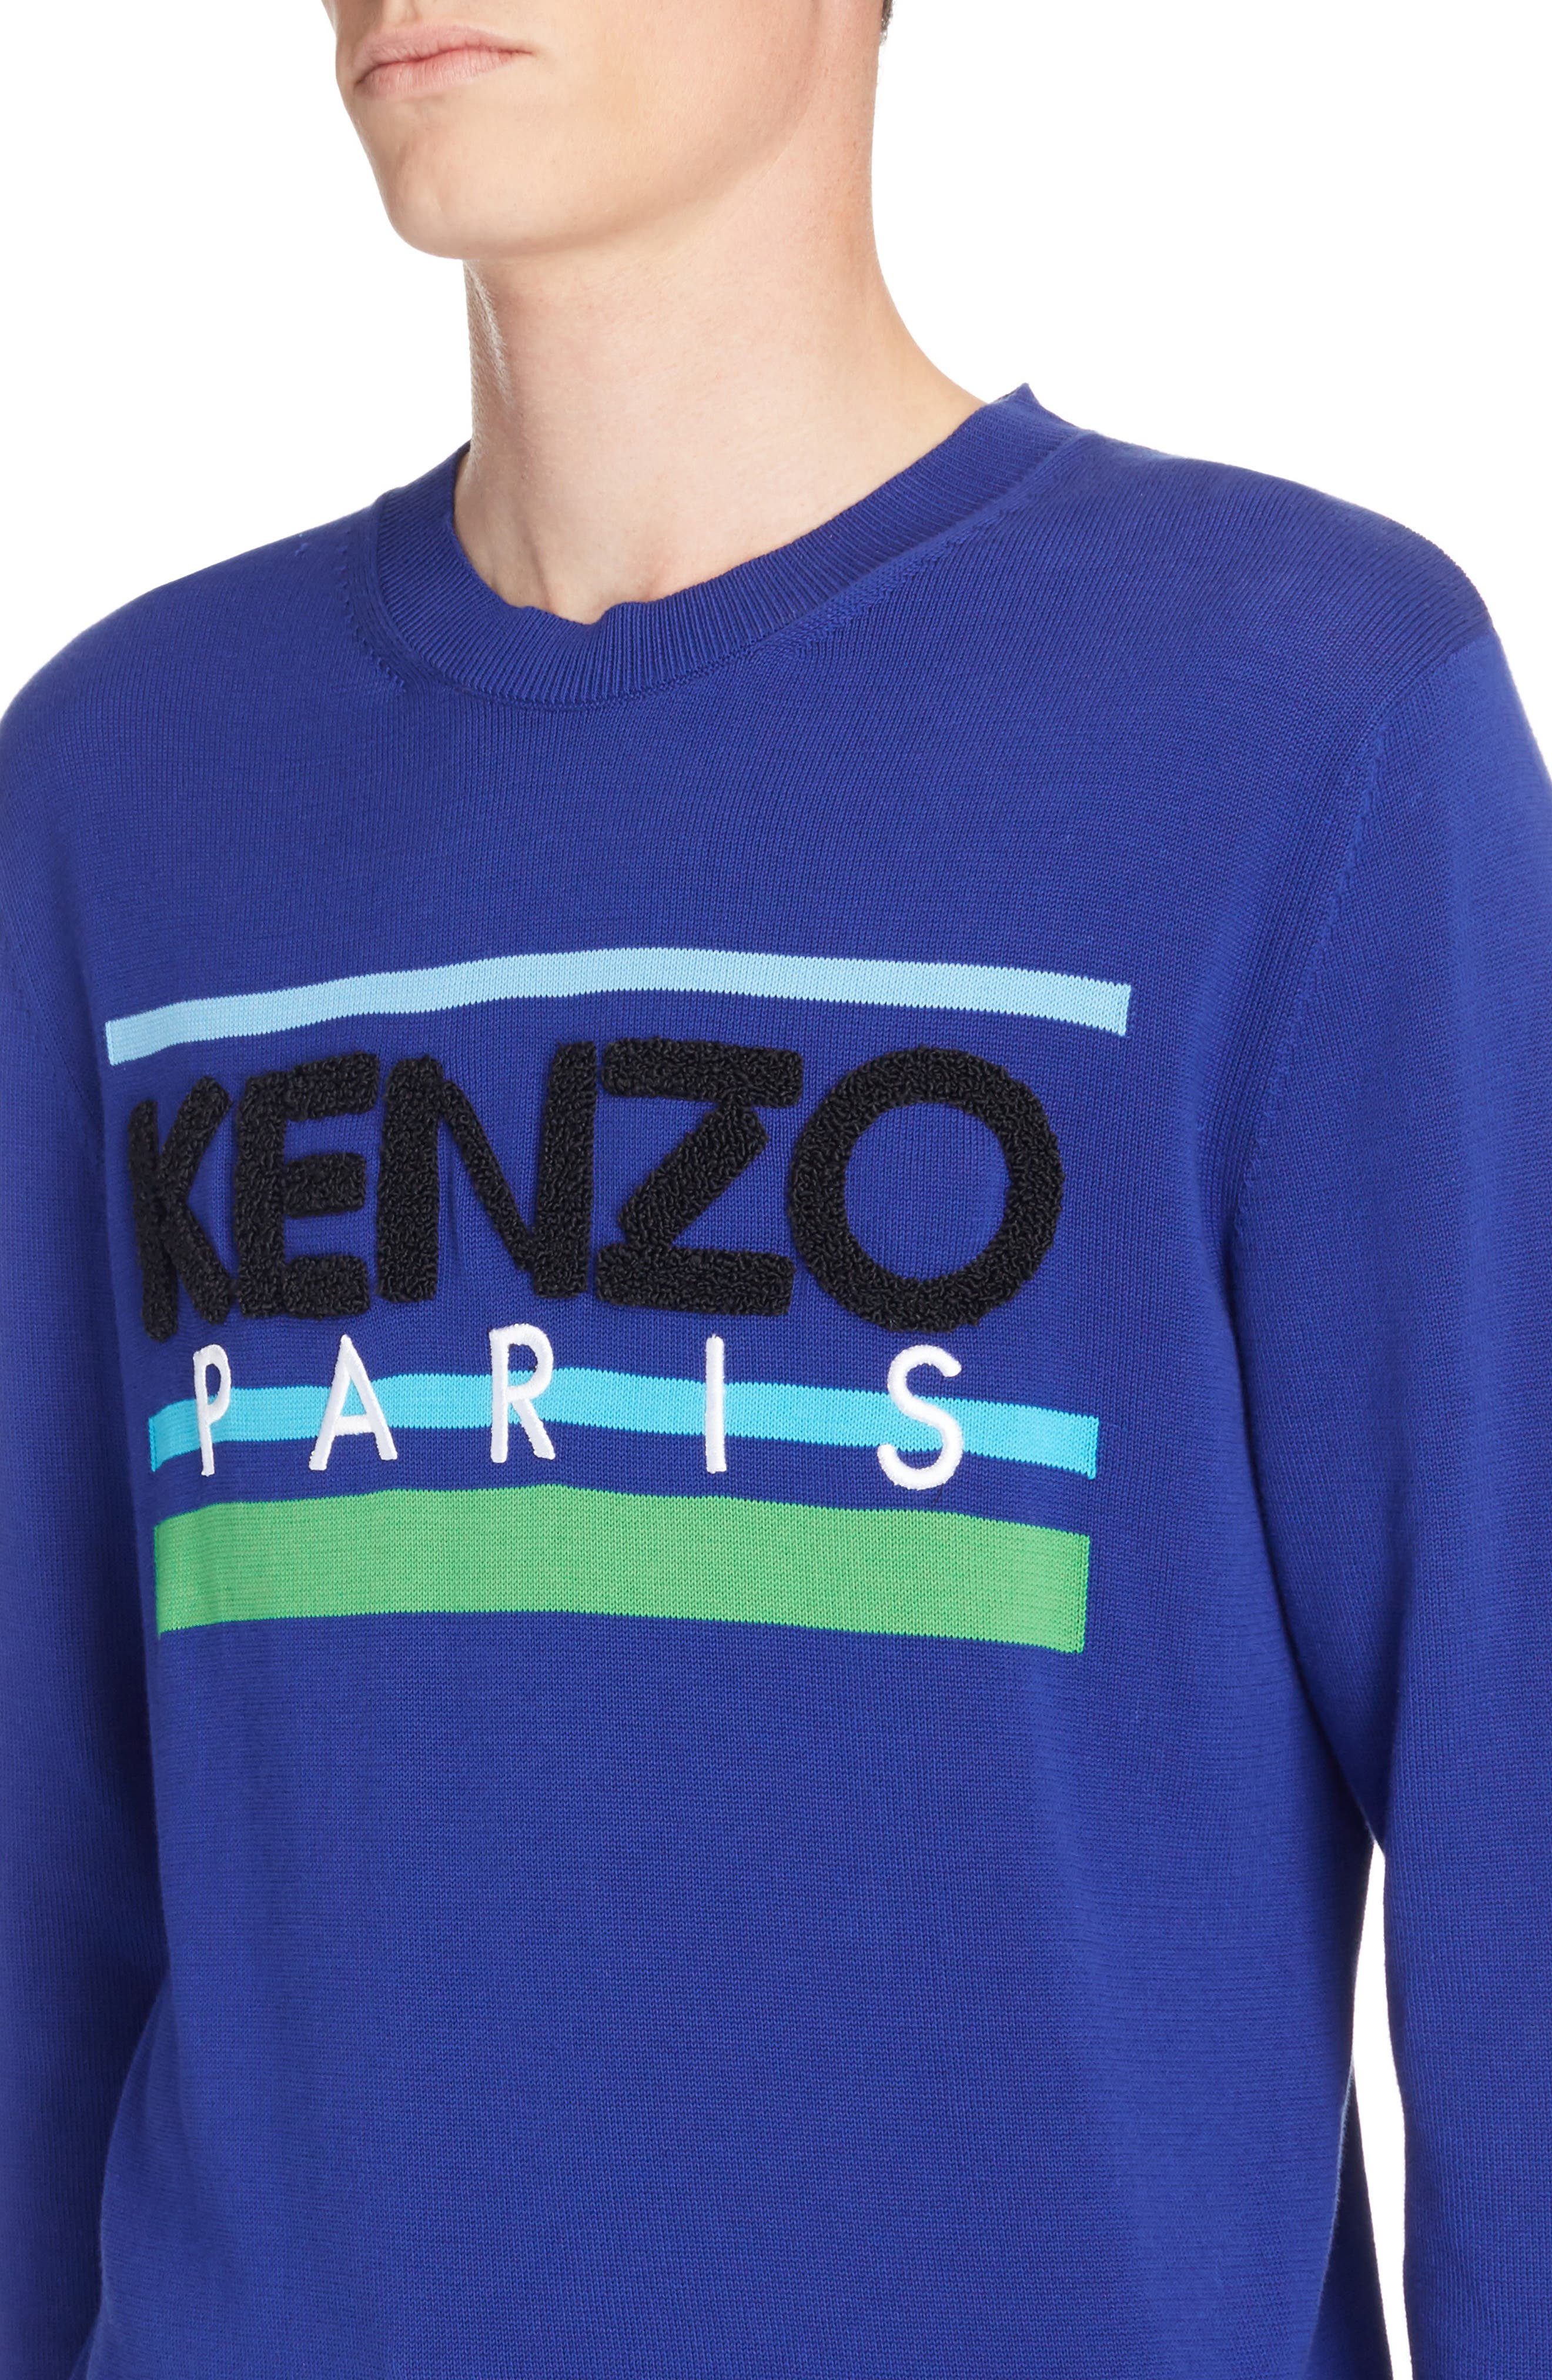 Logo Stripe Sweater,                             Alternate thumbnail 4, color,                             French Blue